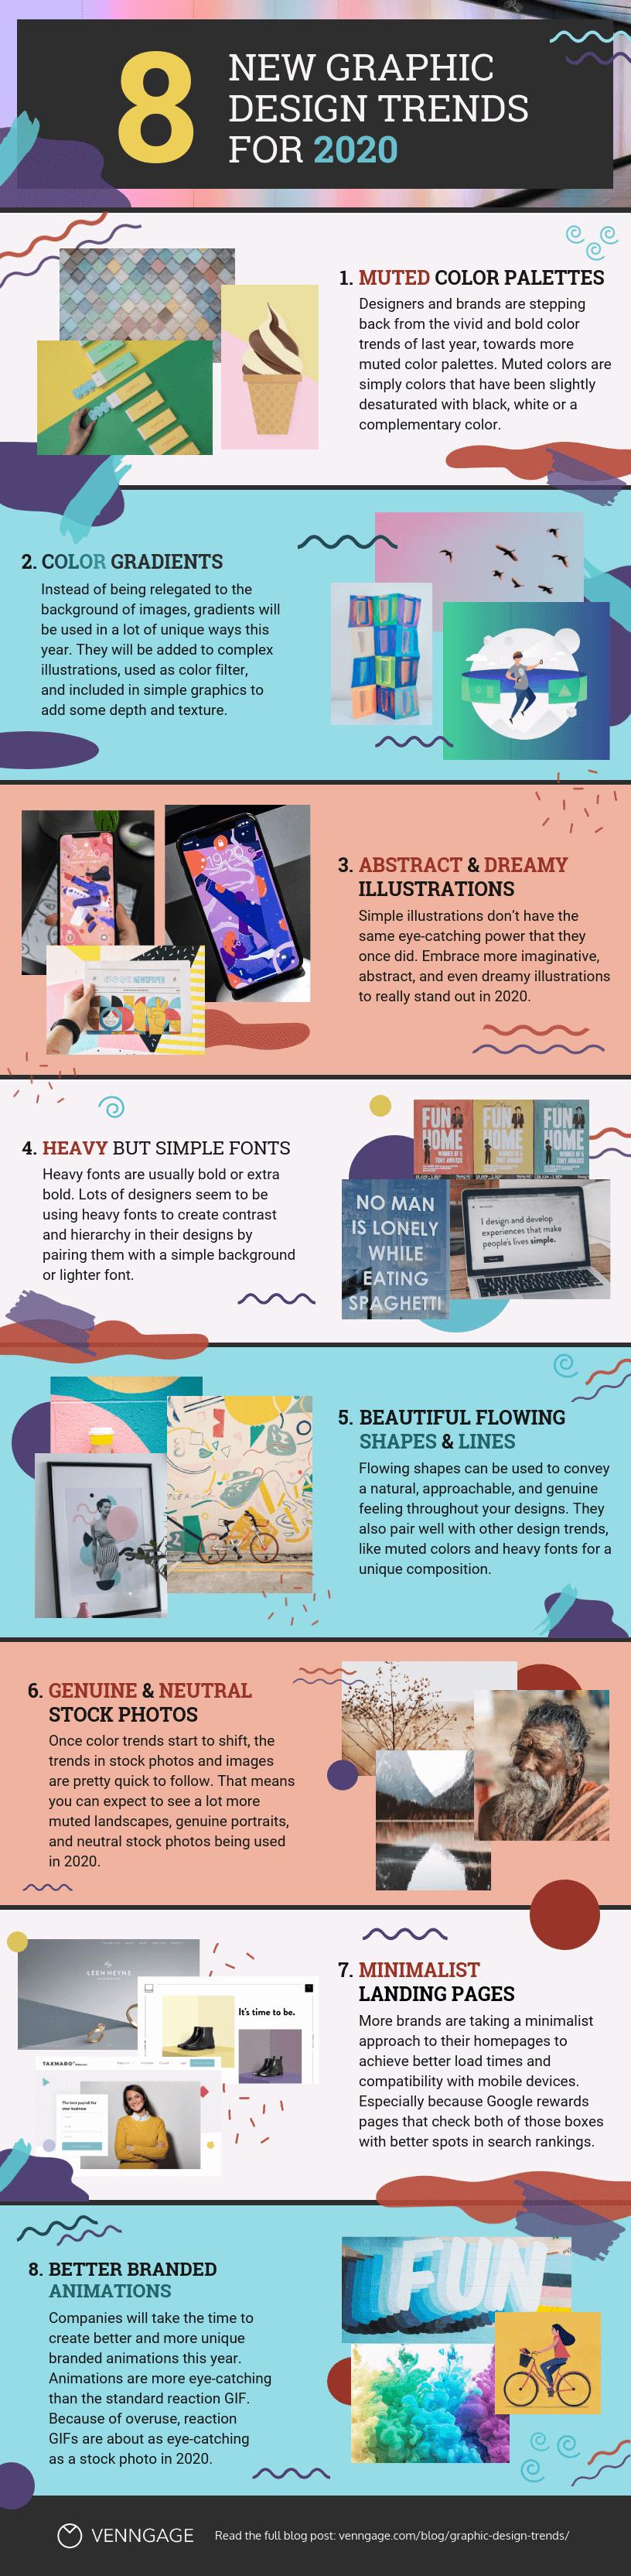 Graphic Design Trends 2020 Template